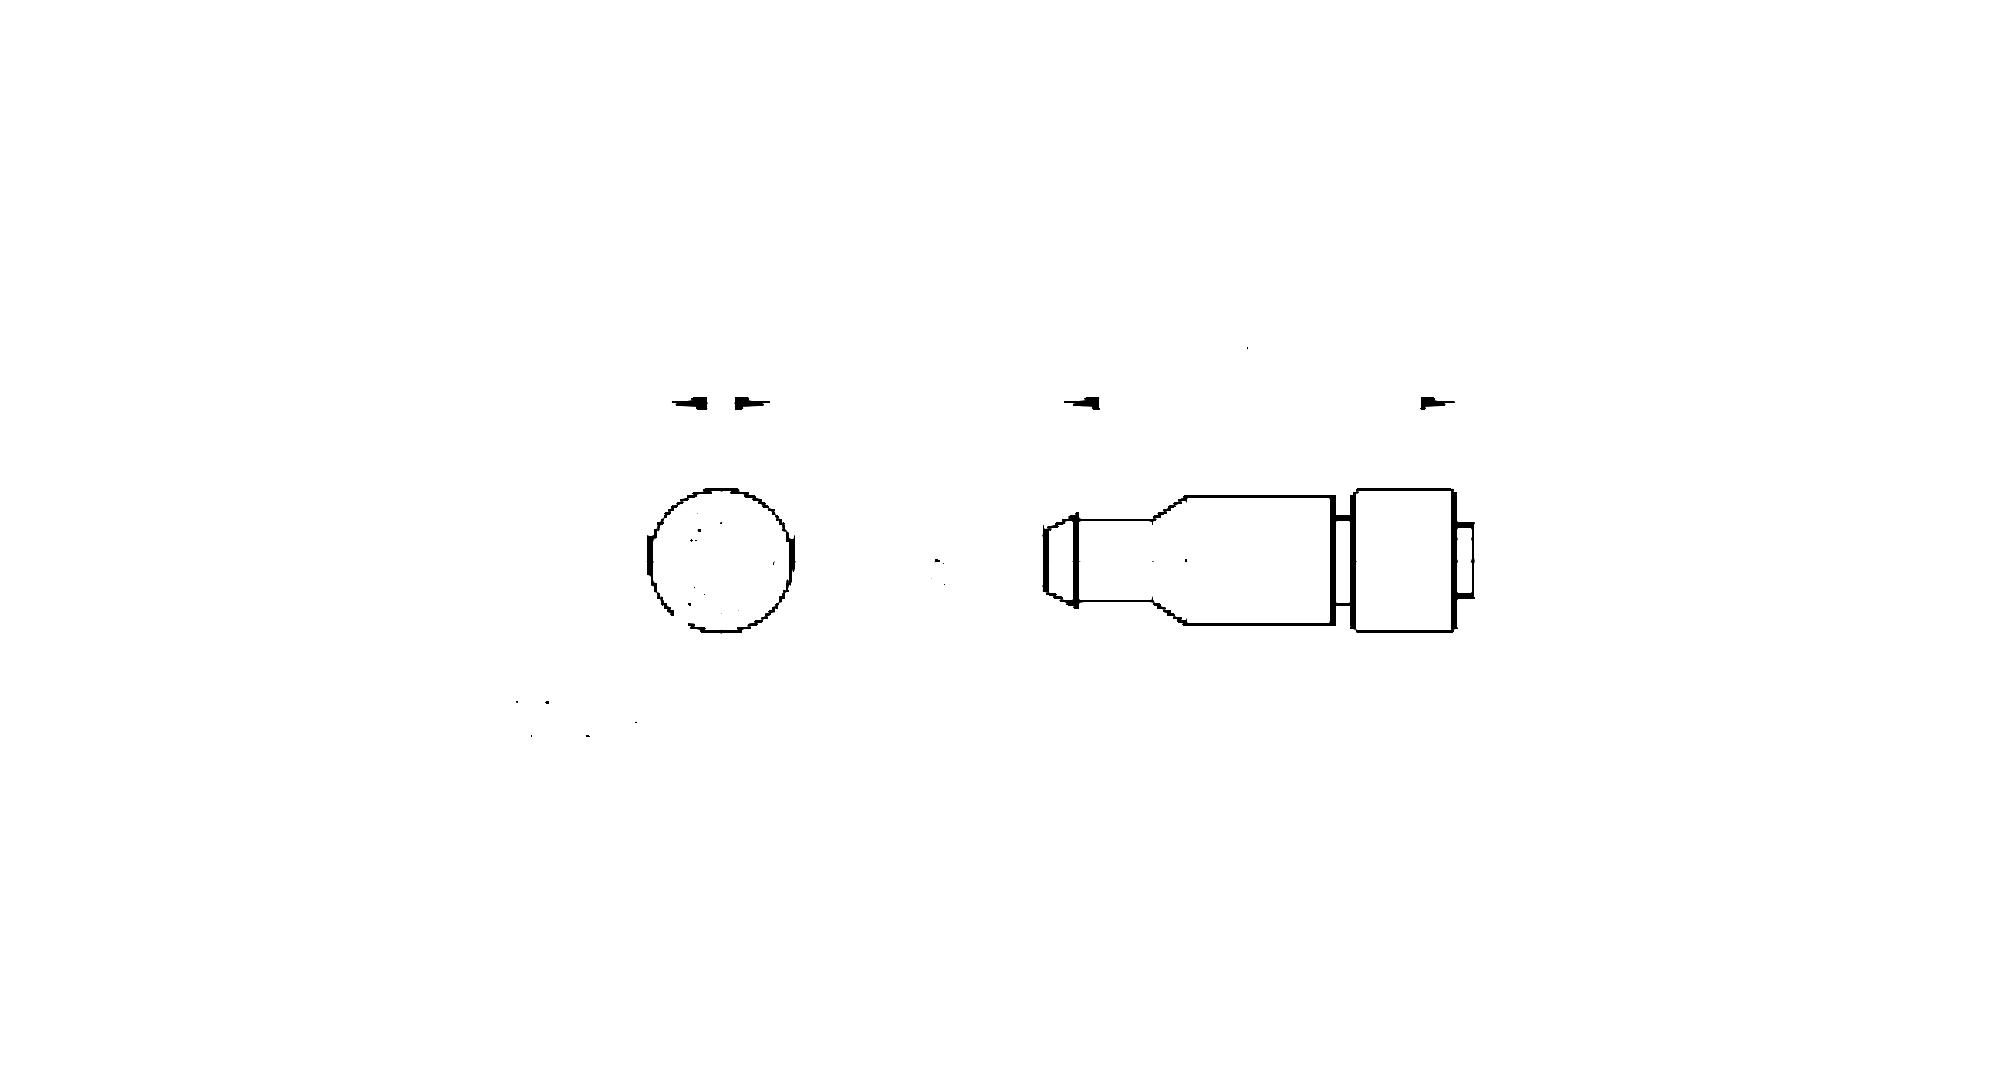 e11311 - female cordset